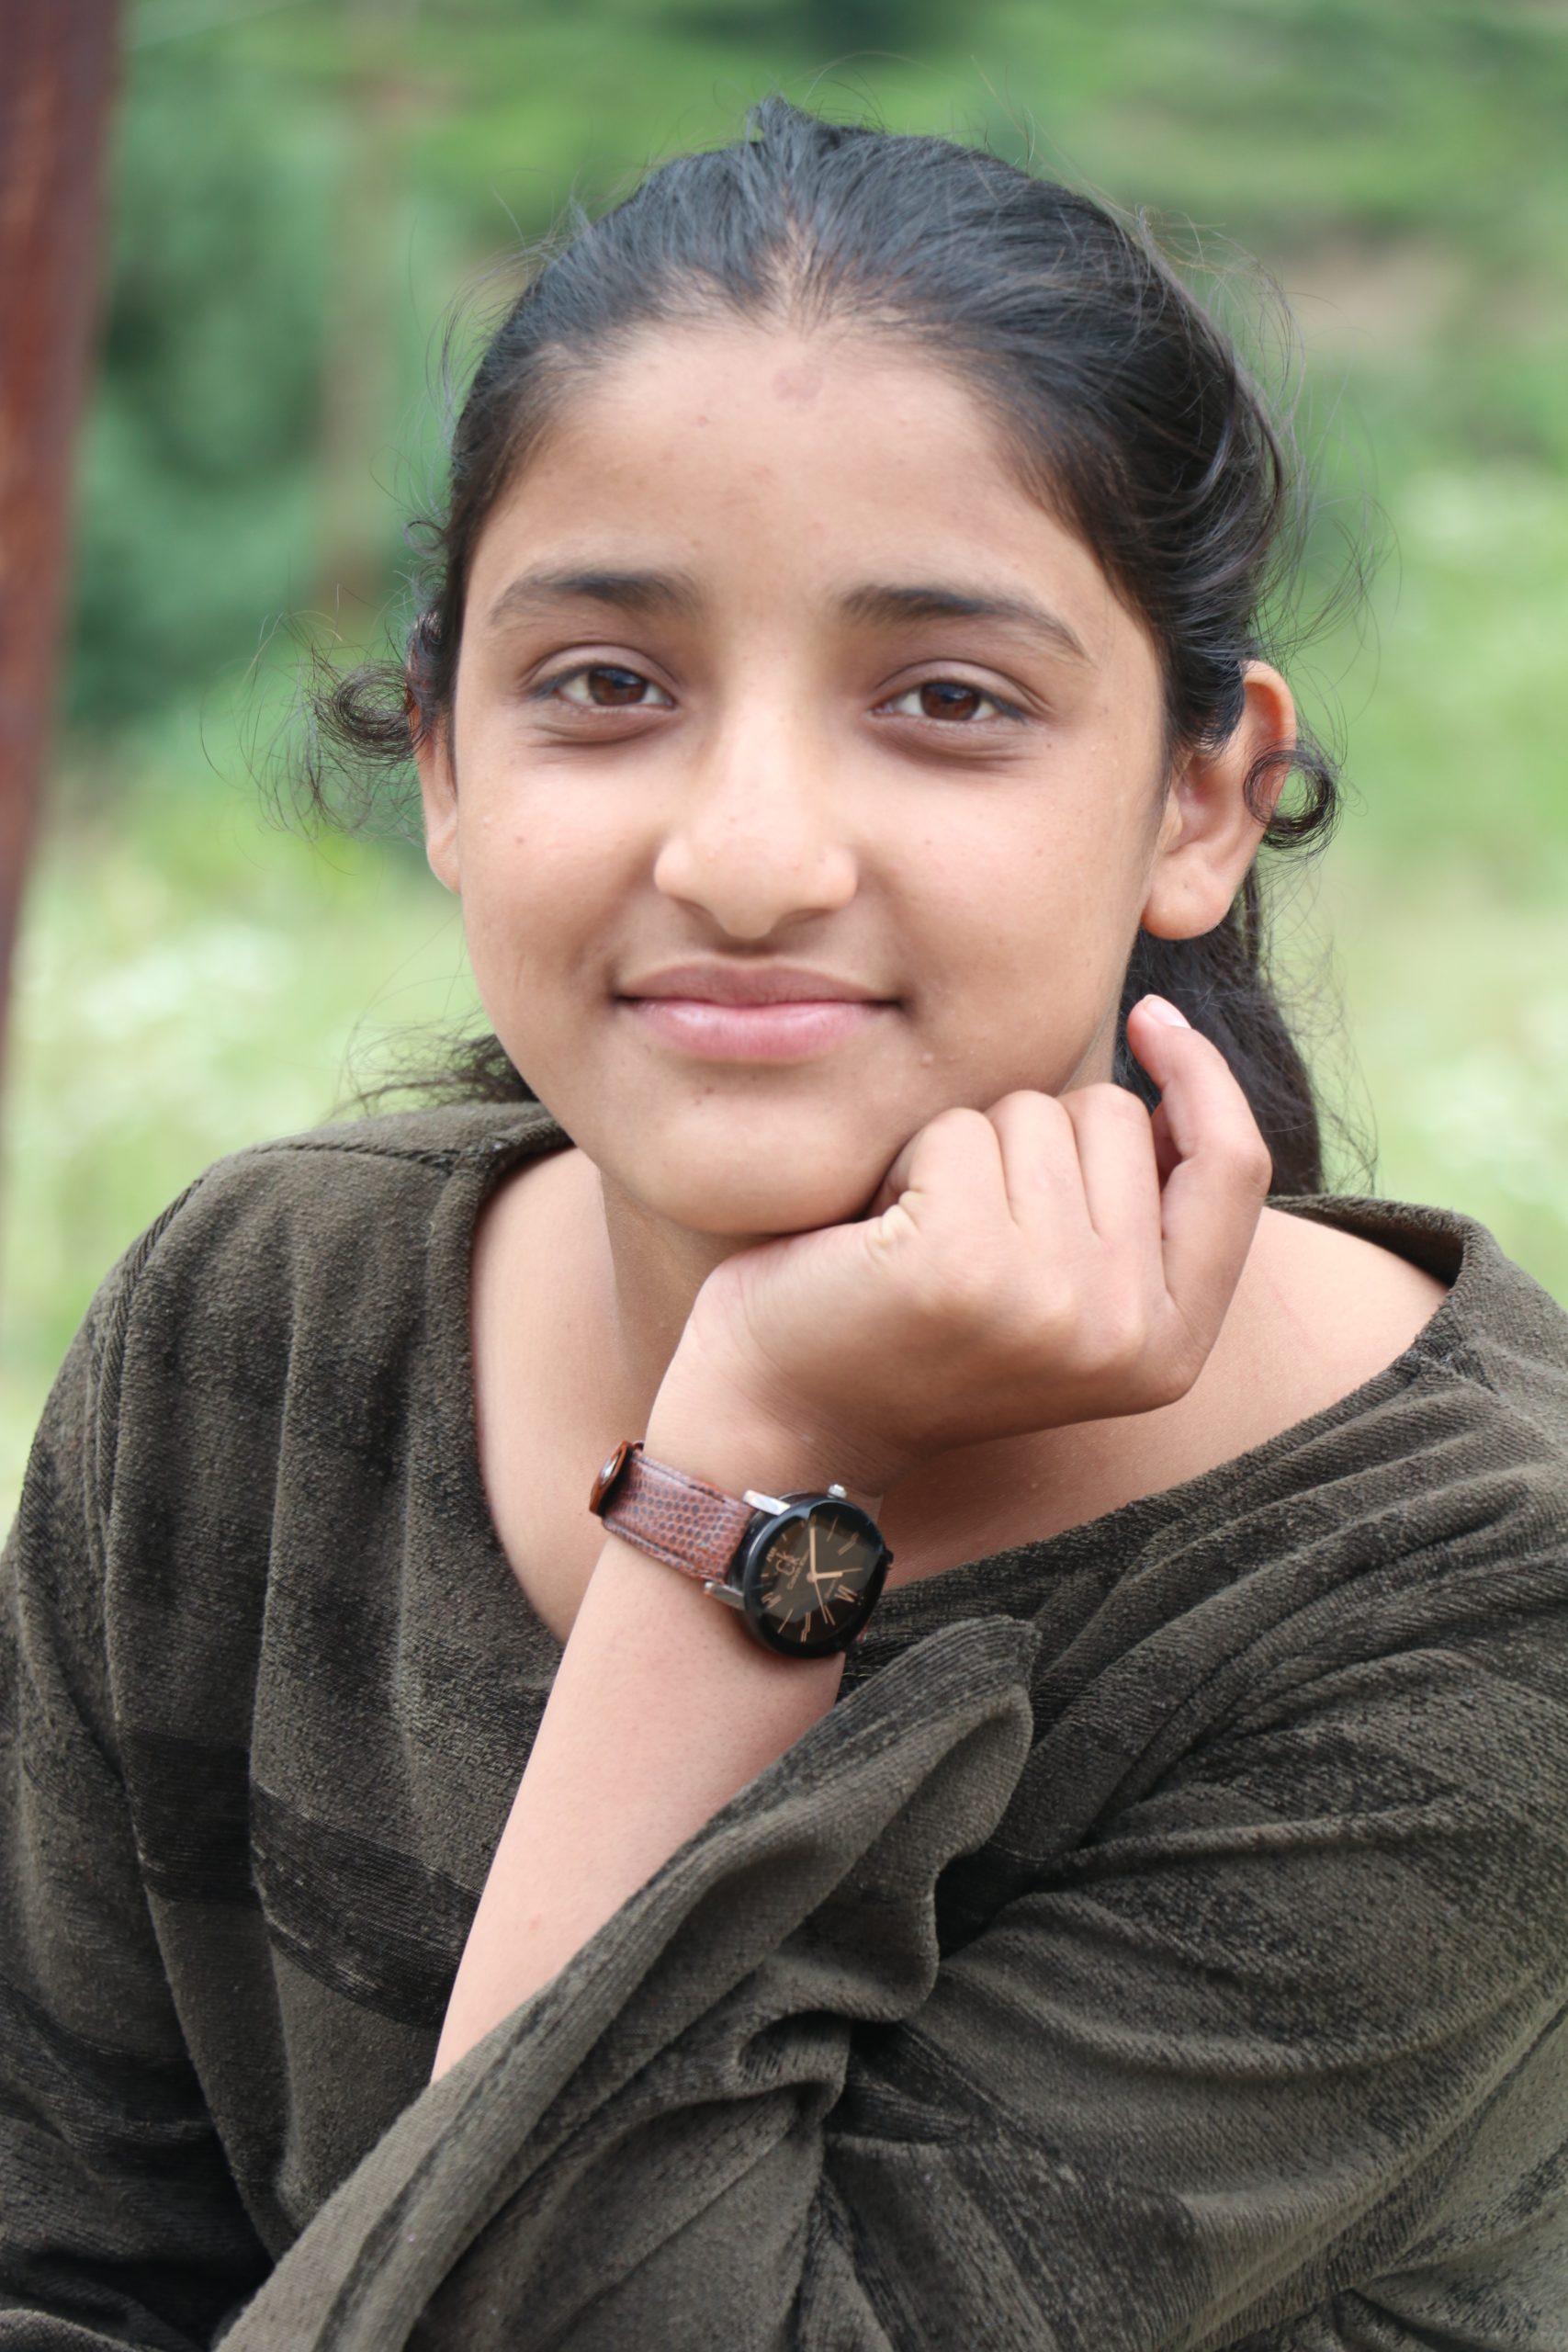 Portrait of a cute girl